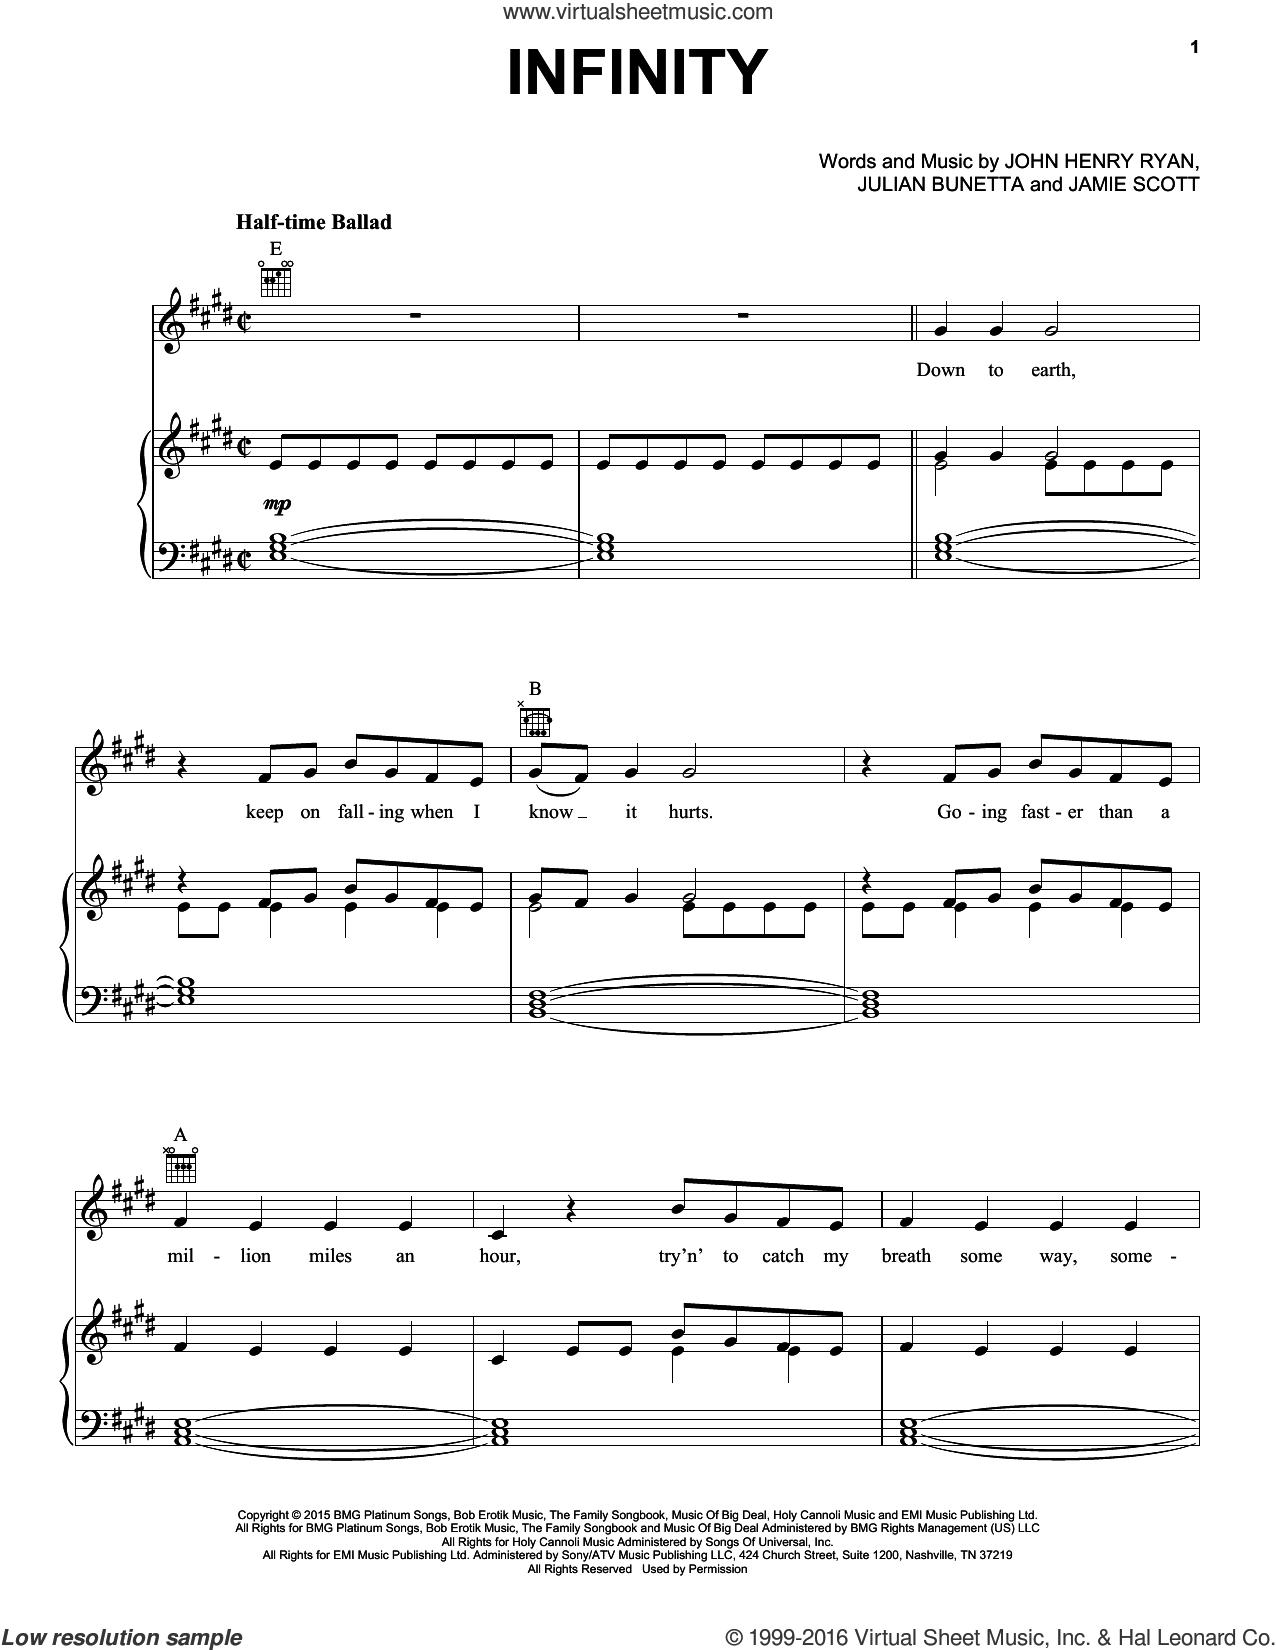 Infinity sheet music for voice, piano or guitar by One Direction, Jamie Scott, John Henry Ryan and Julian Bunetta, intermediate skill level